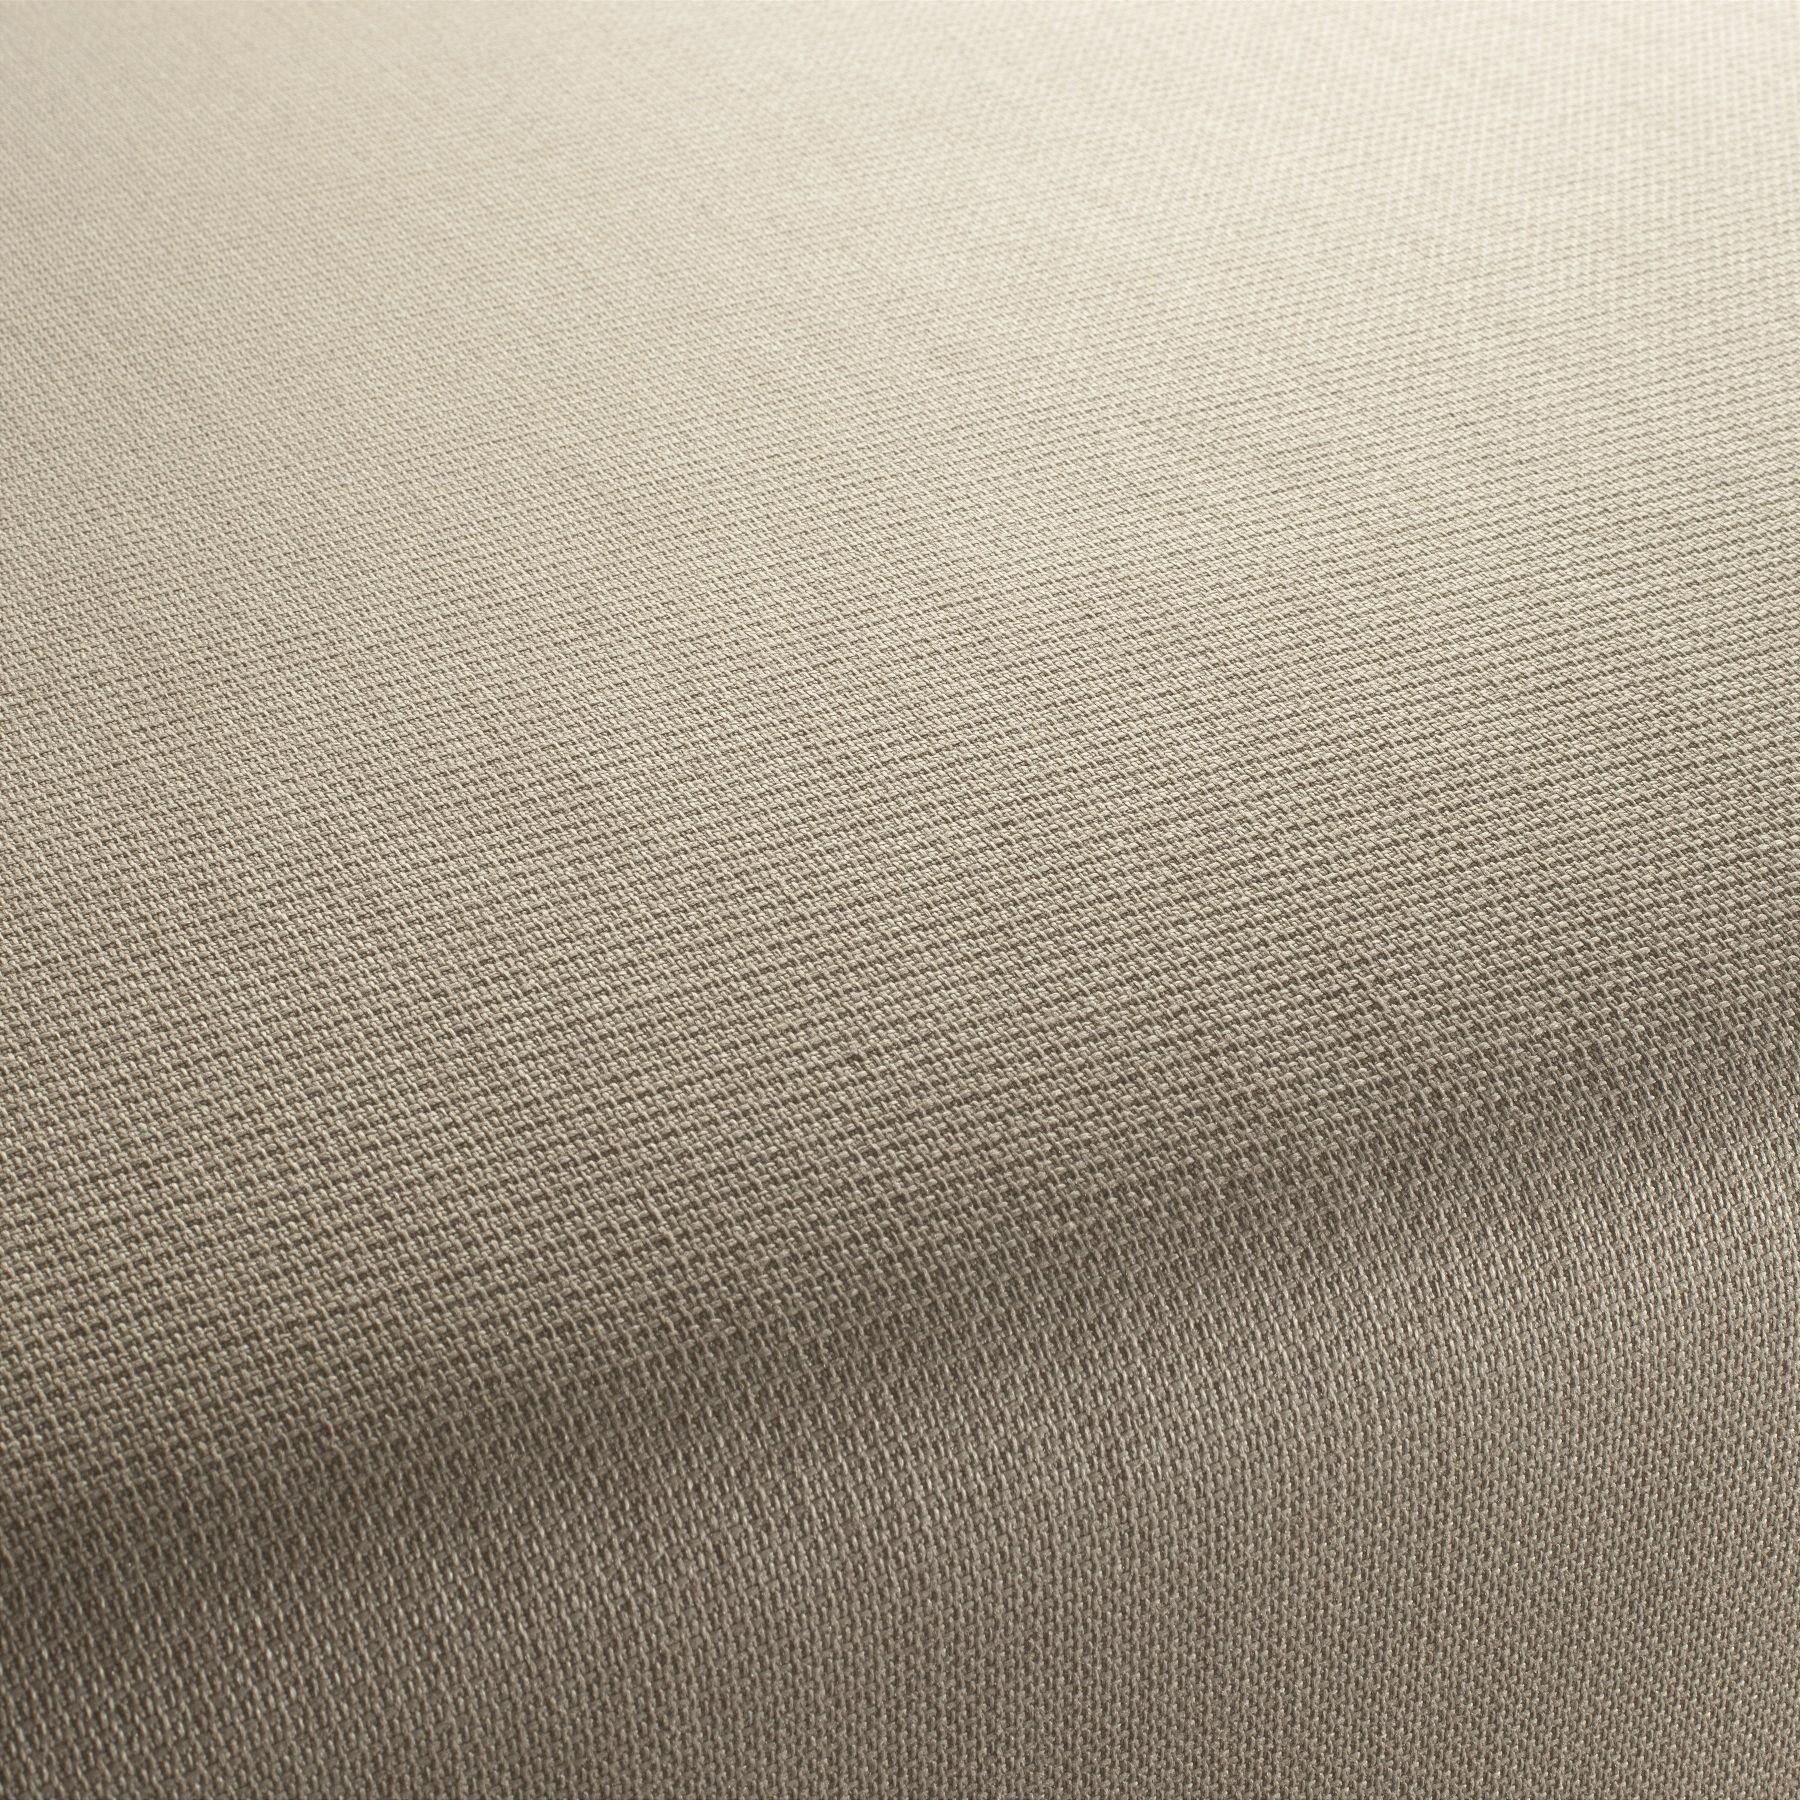 upholstery fabric vito vol 2 1 1309 077 jab anstoetz. Black Bedroom Furniture Sets. Home Design Ideas